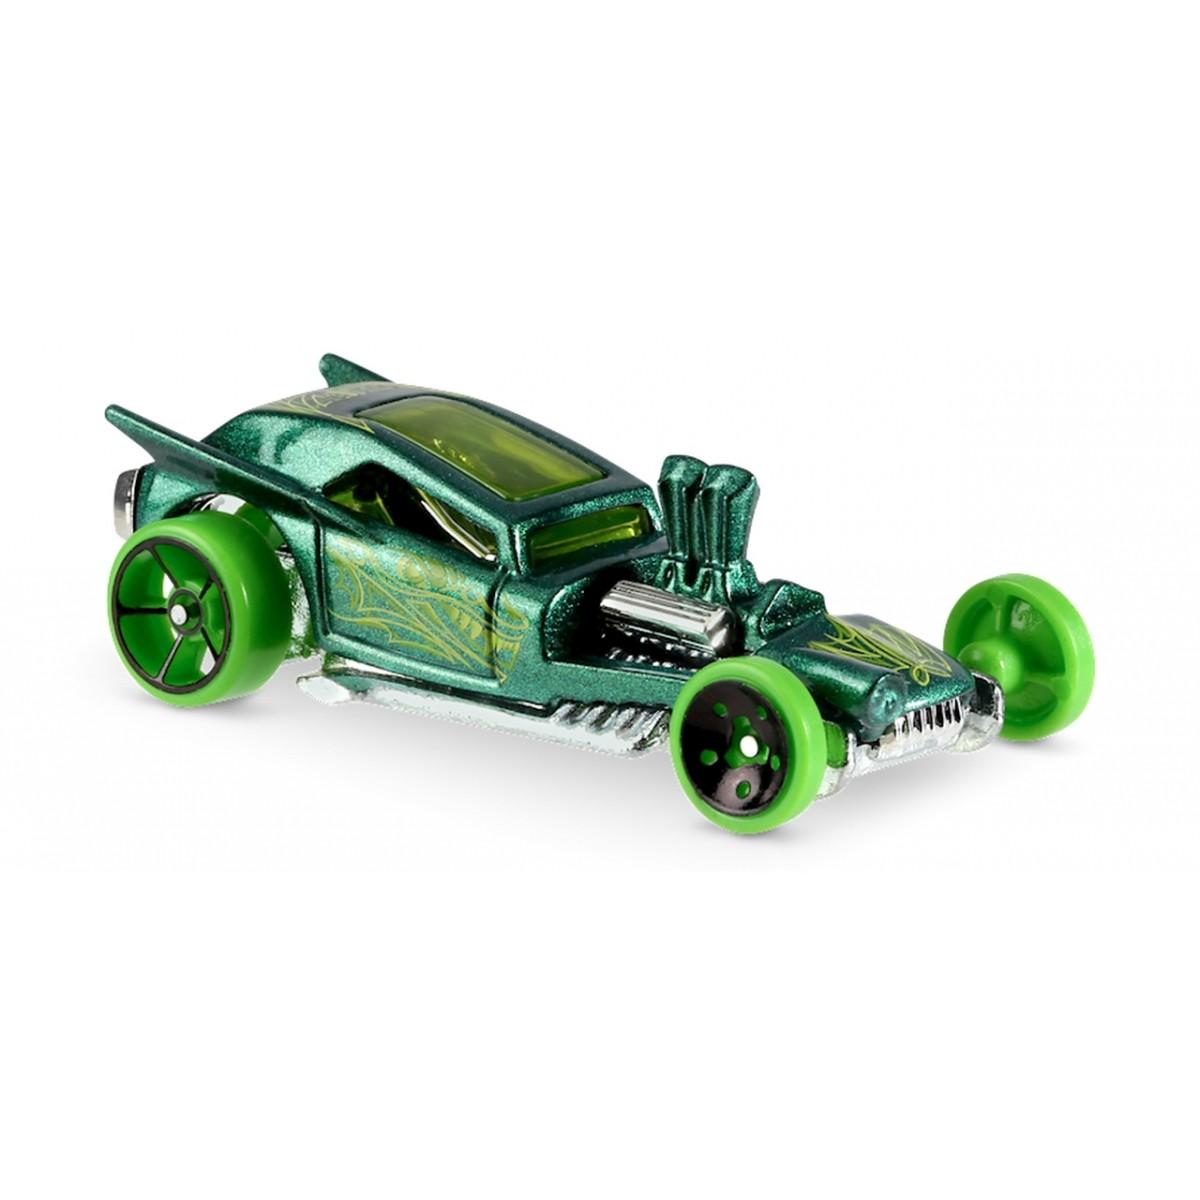 Carrinho Hot Wheels: Fangula Verde